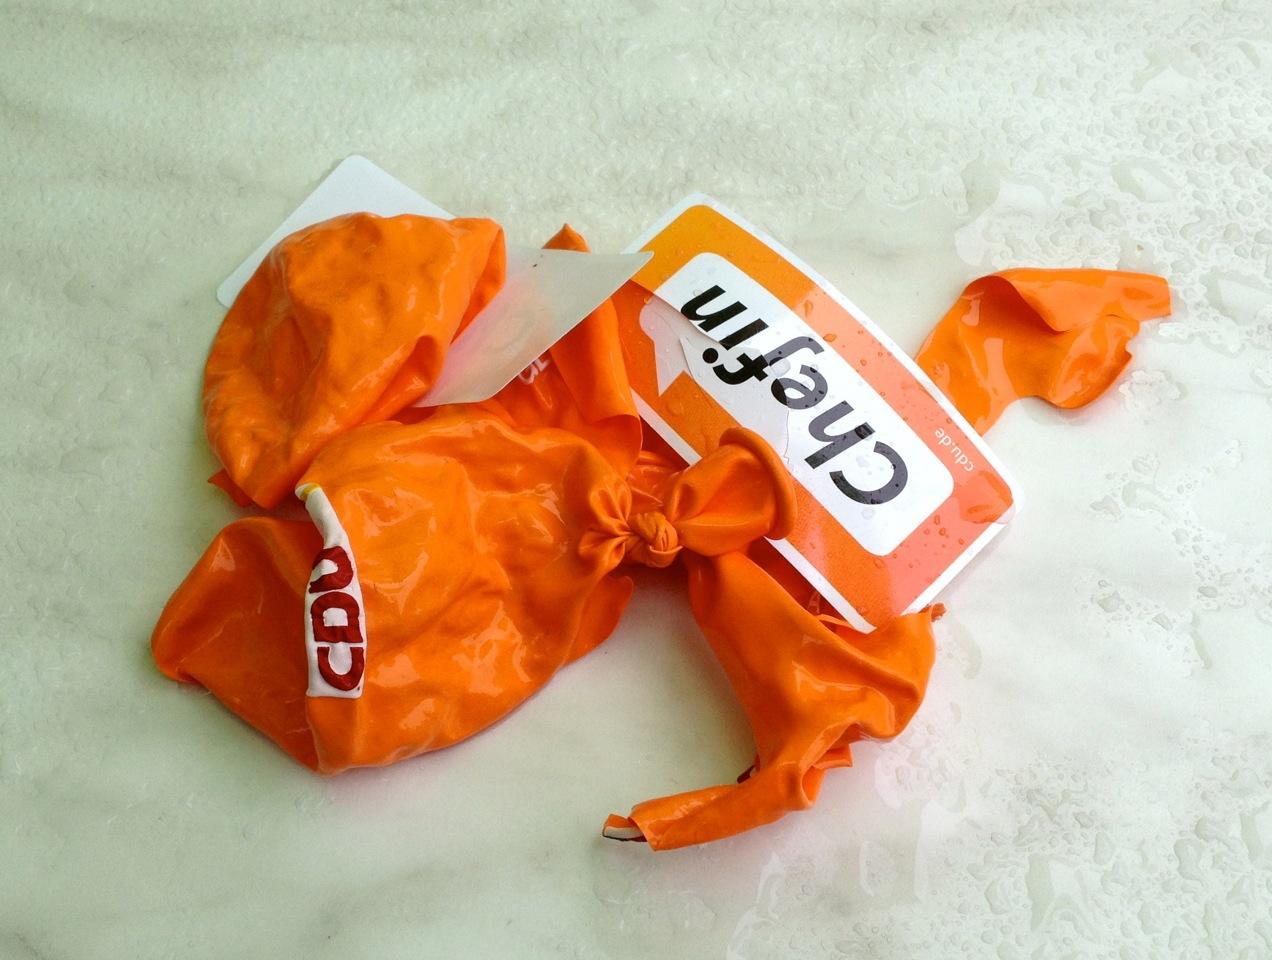 Kaputte orangene CDU-Luftballons